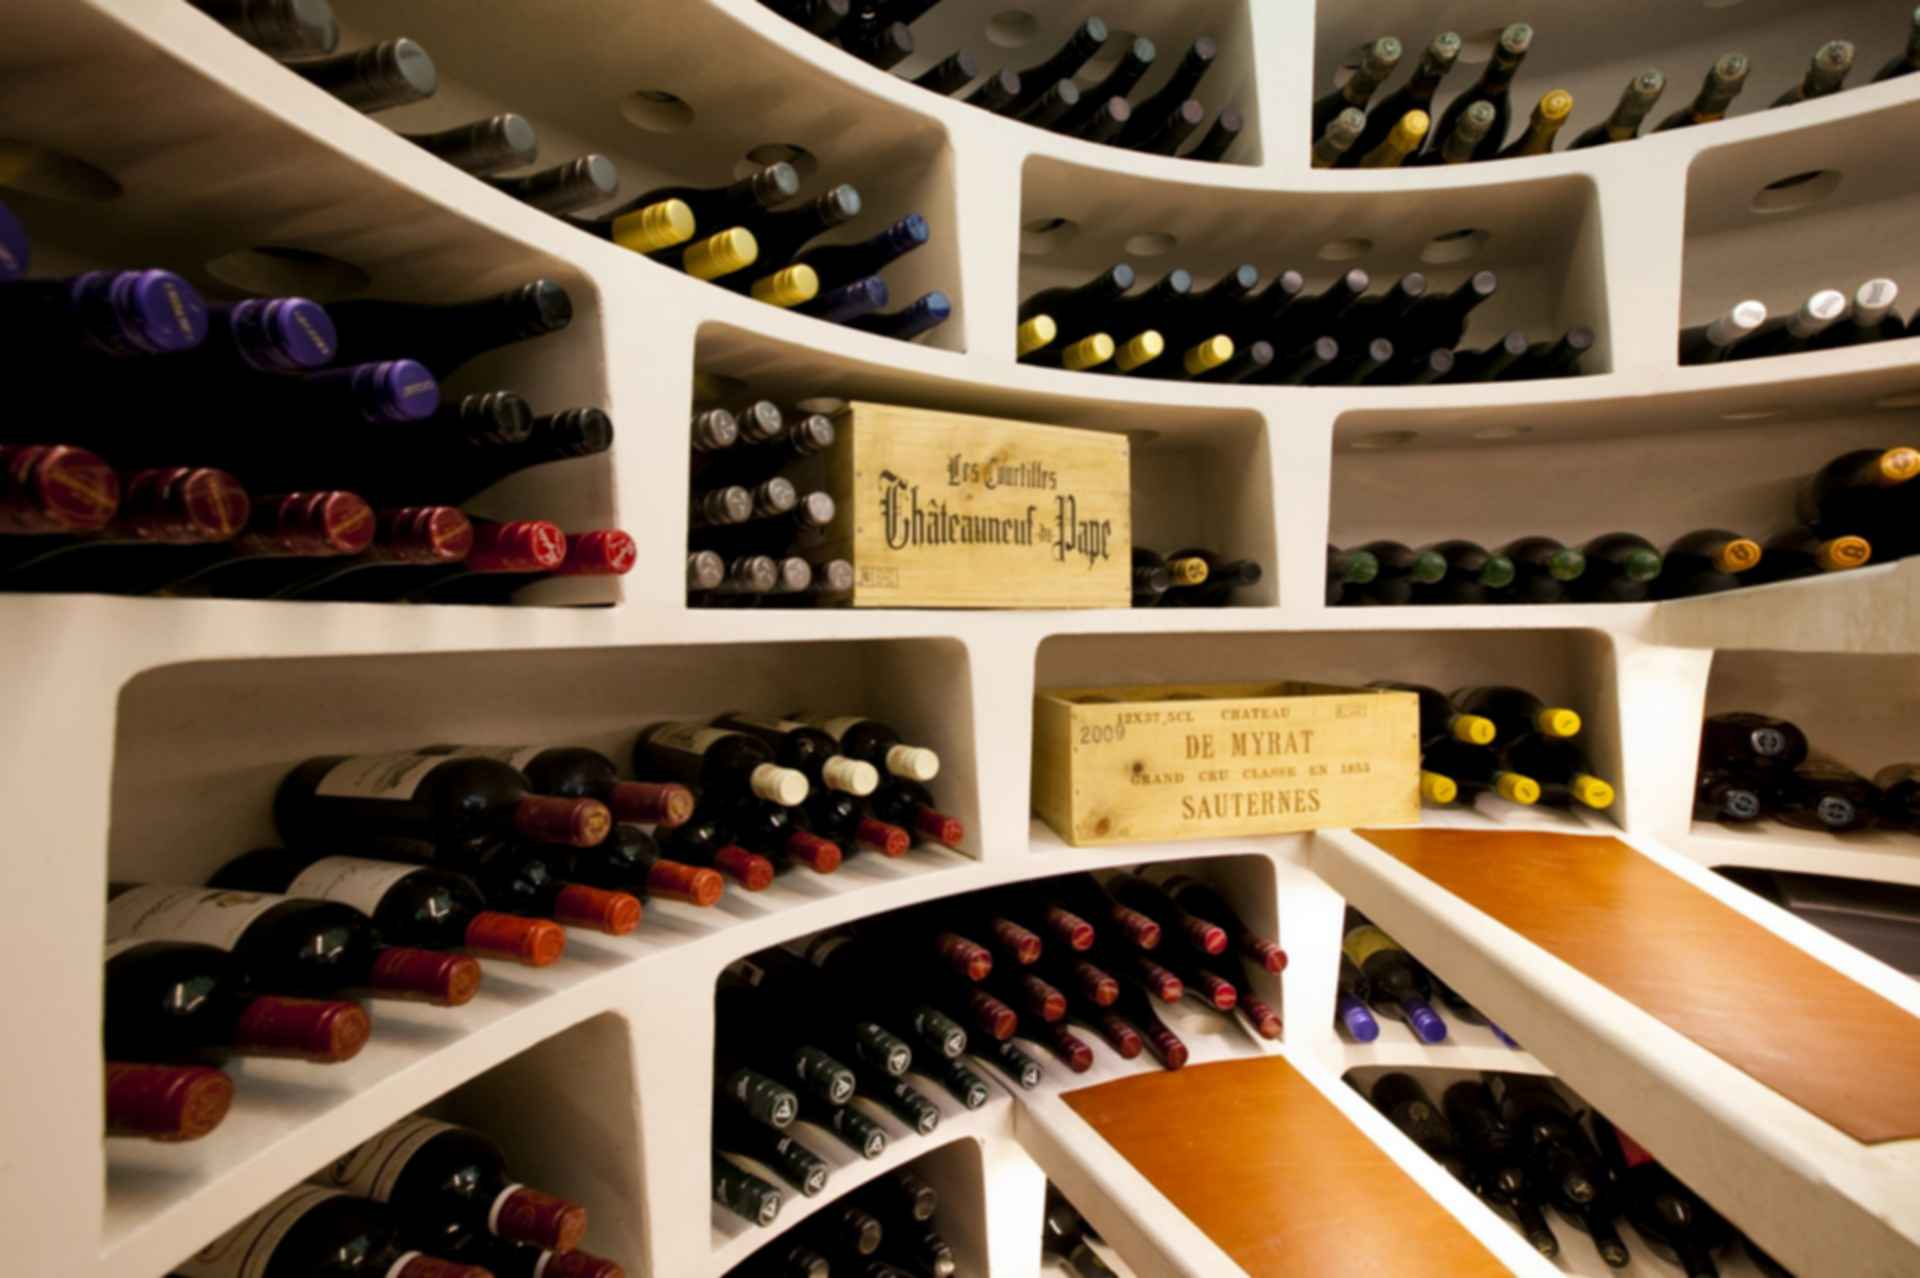 Secret Wine Cellars - Inside a Secret Cellar